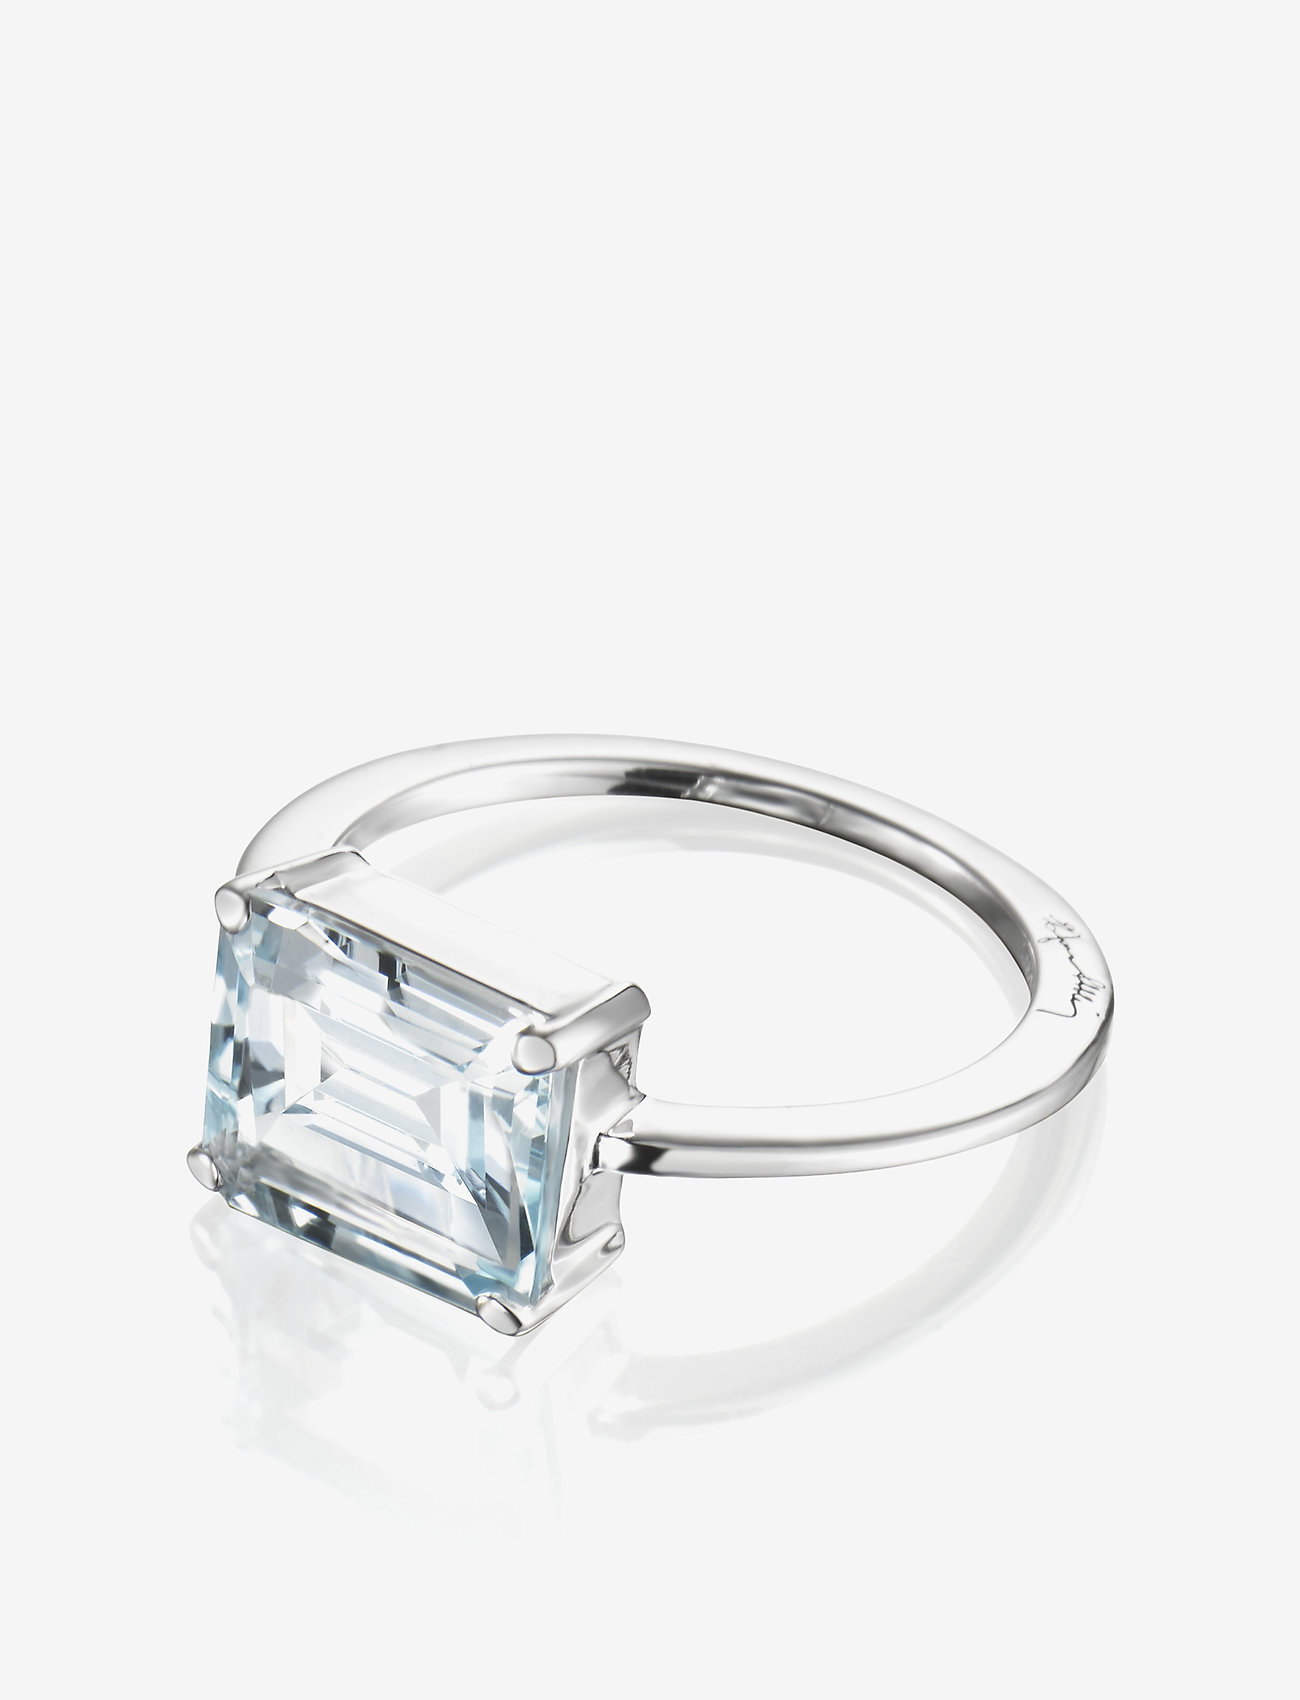 Efva Attling - A Macaron Dream Ring - bagues - silver